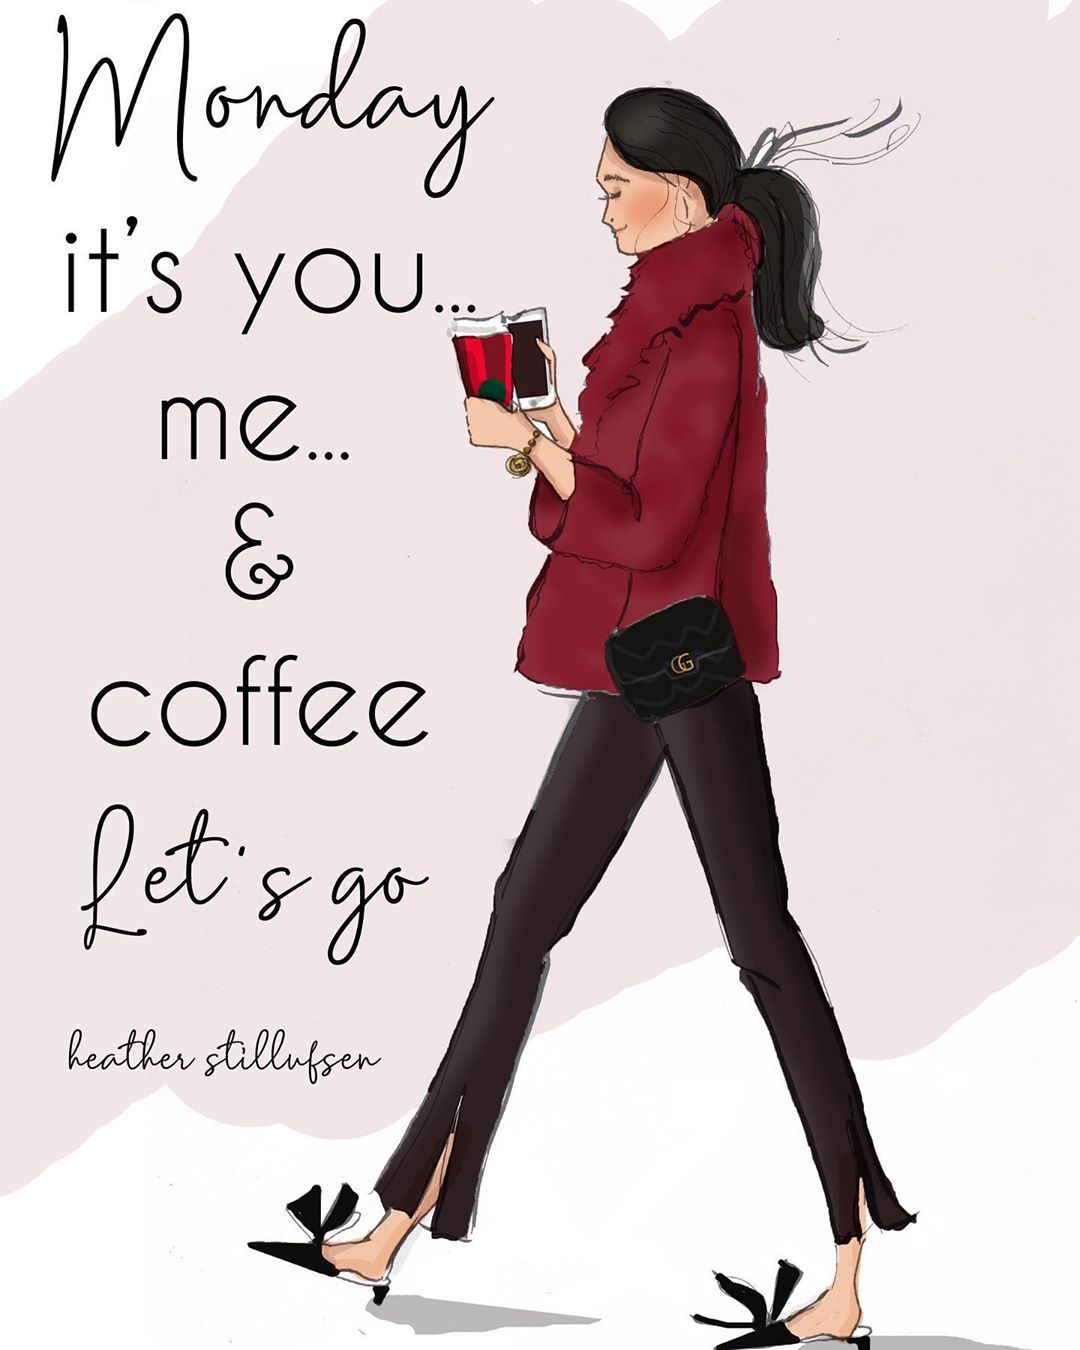 Heather Stillufsen On Instagram Monday It S Me You And Coffee Let S Go Heath Heather Stillufsen Heather Stillufsen Quotes Fashion Week Quotes